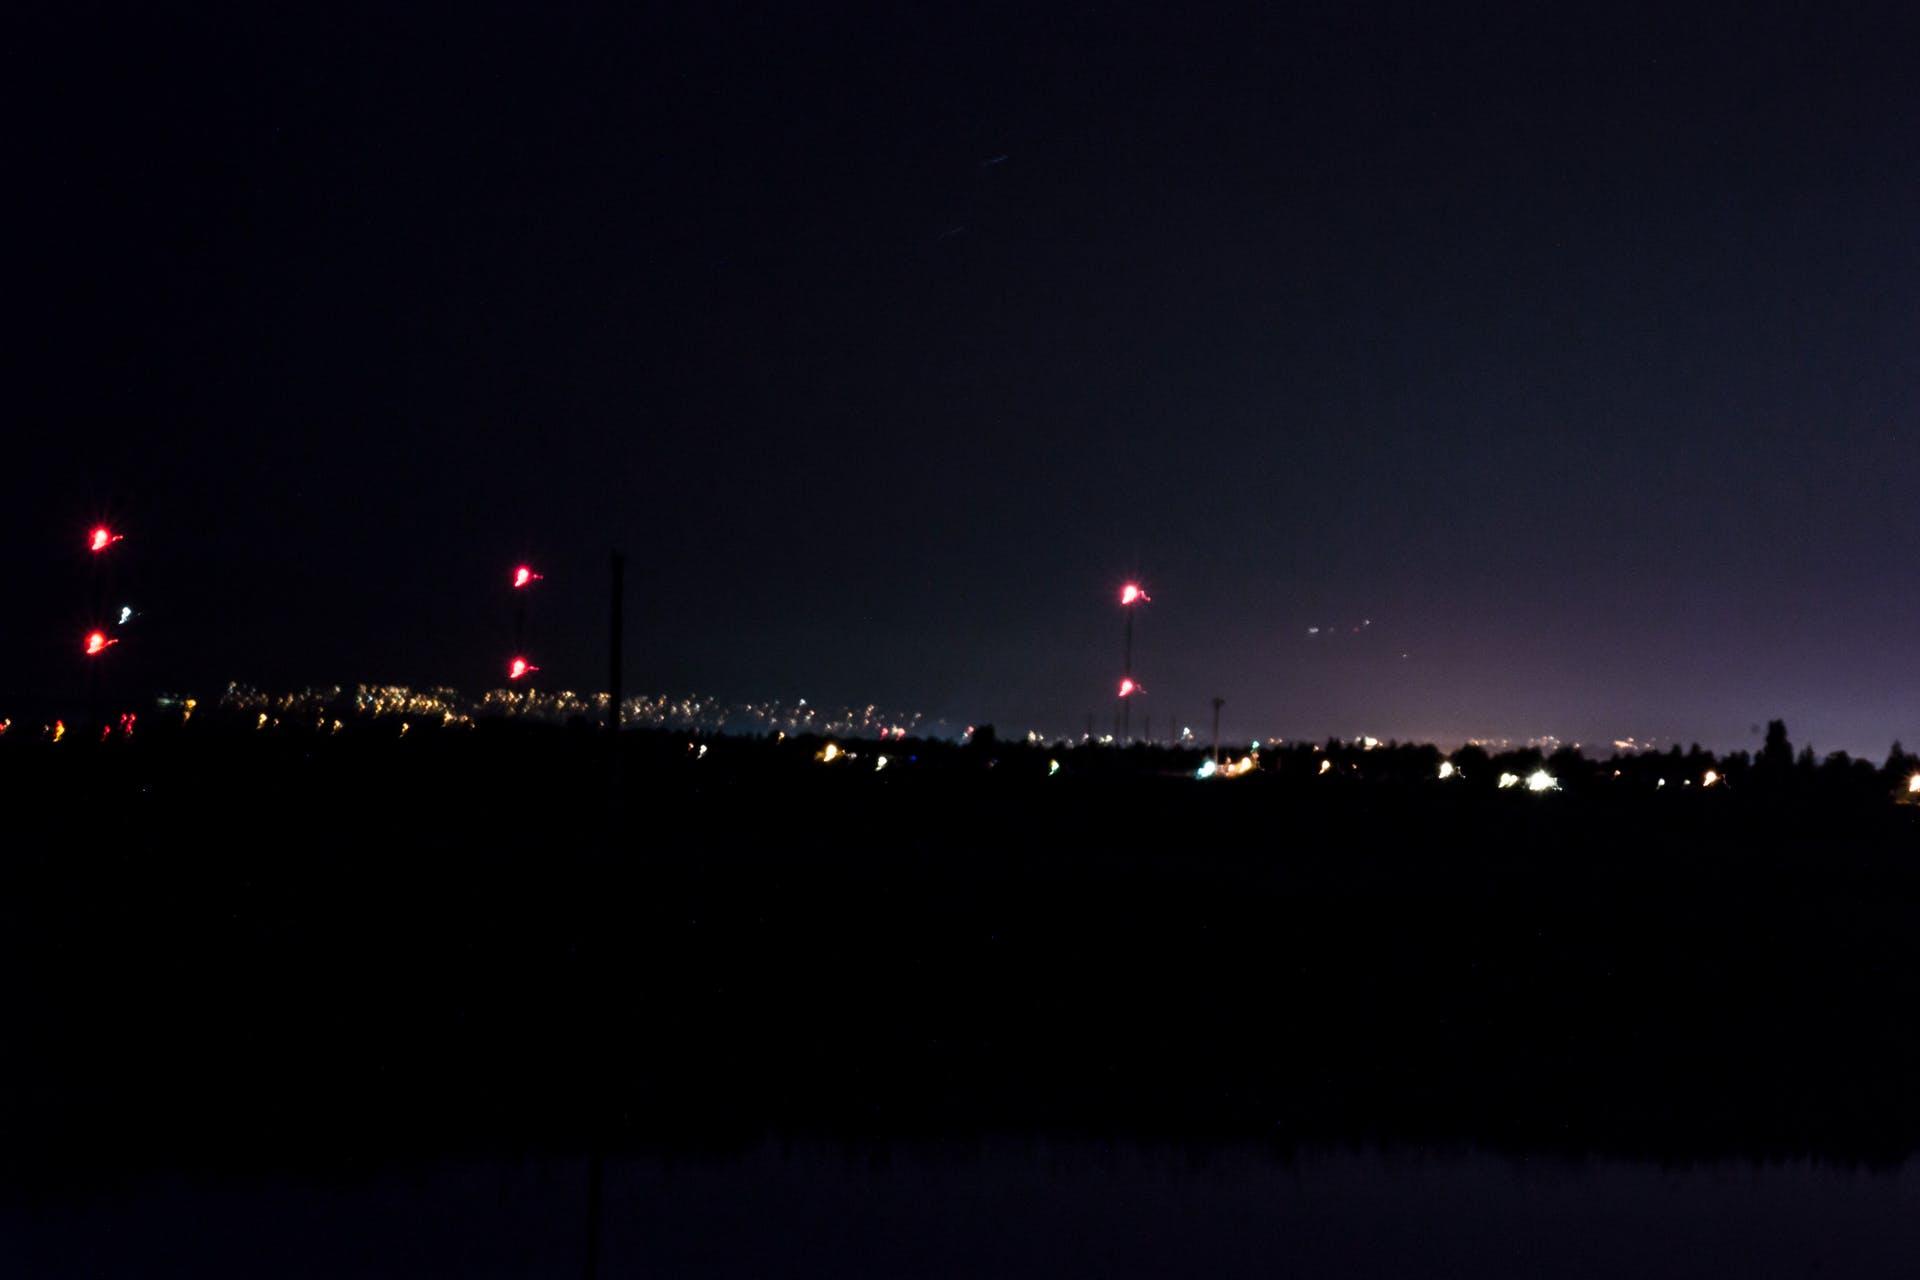 blurry background background horizon